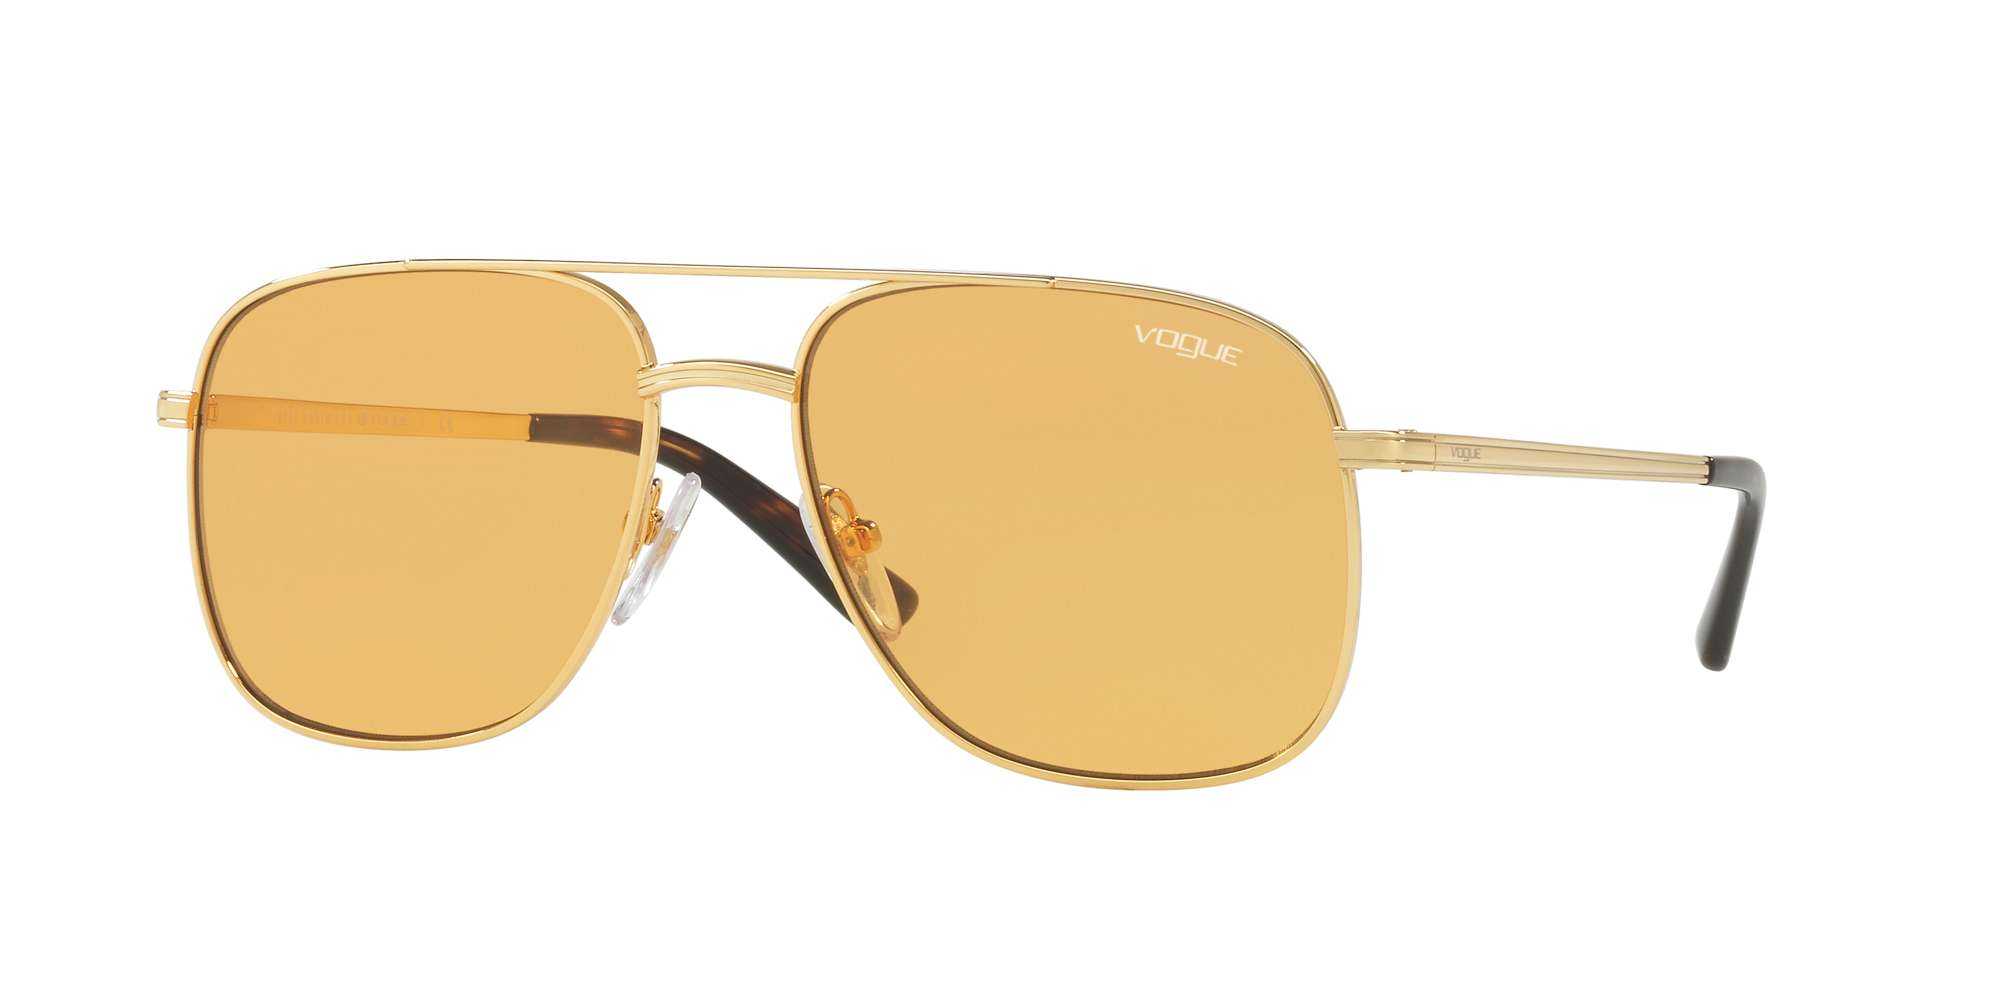 GOLD / ORANGE lenses